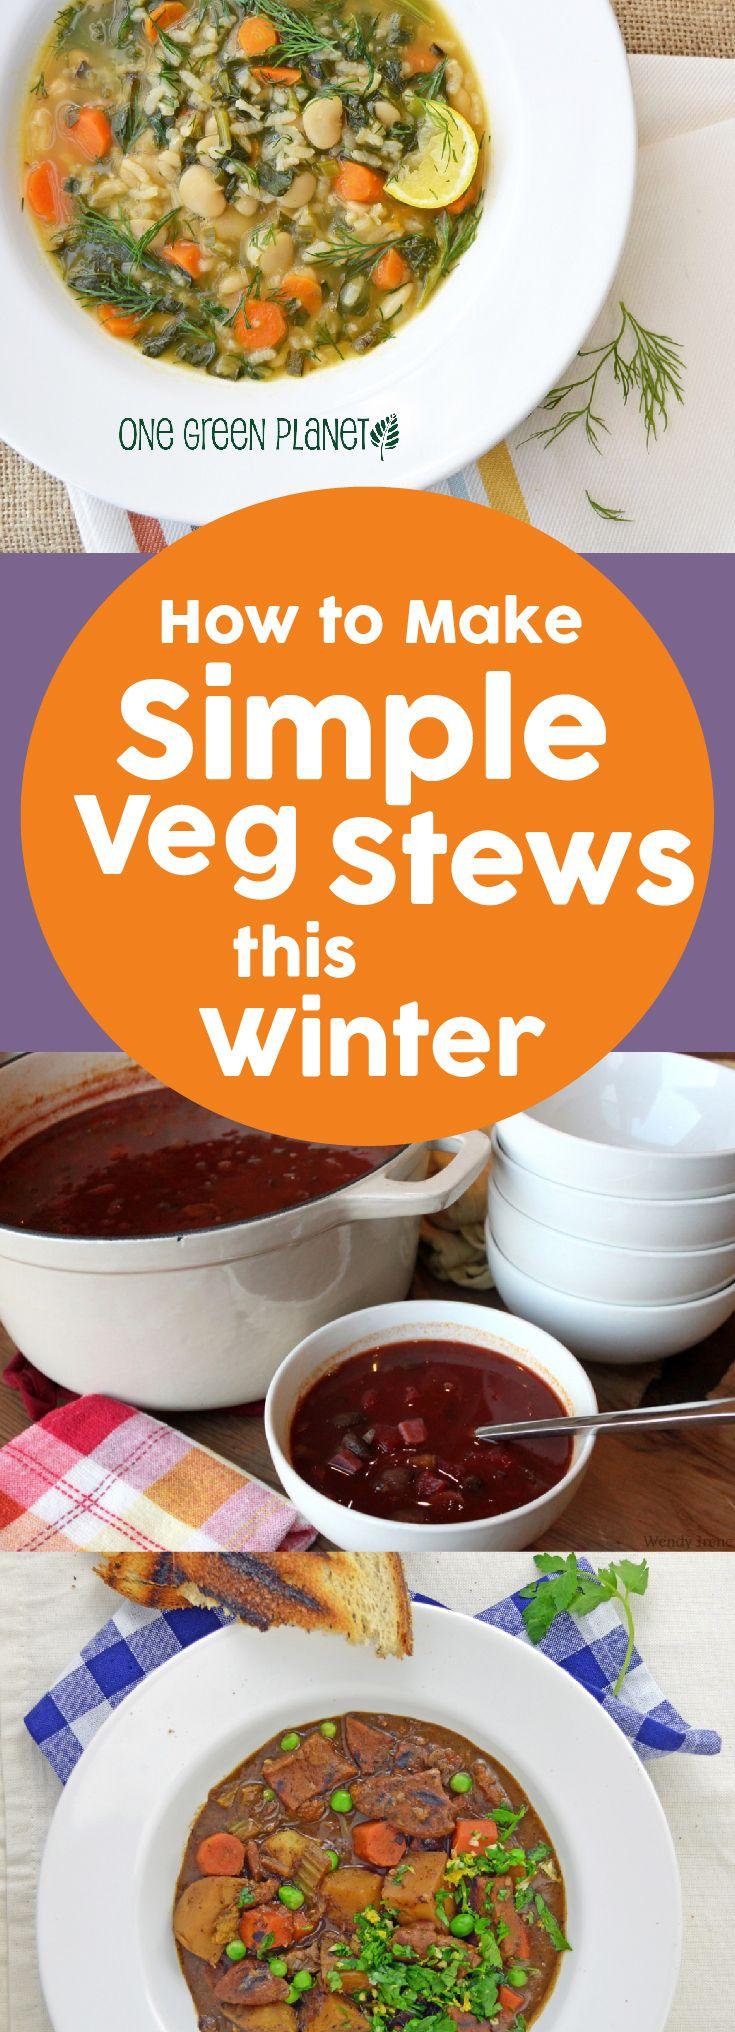 How to make simple veg stews  #vegan #vegetarian